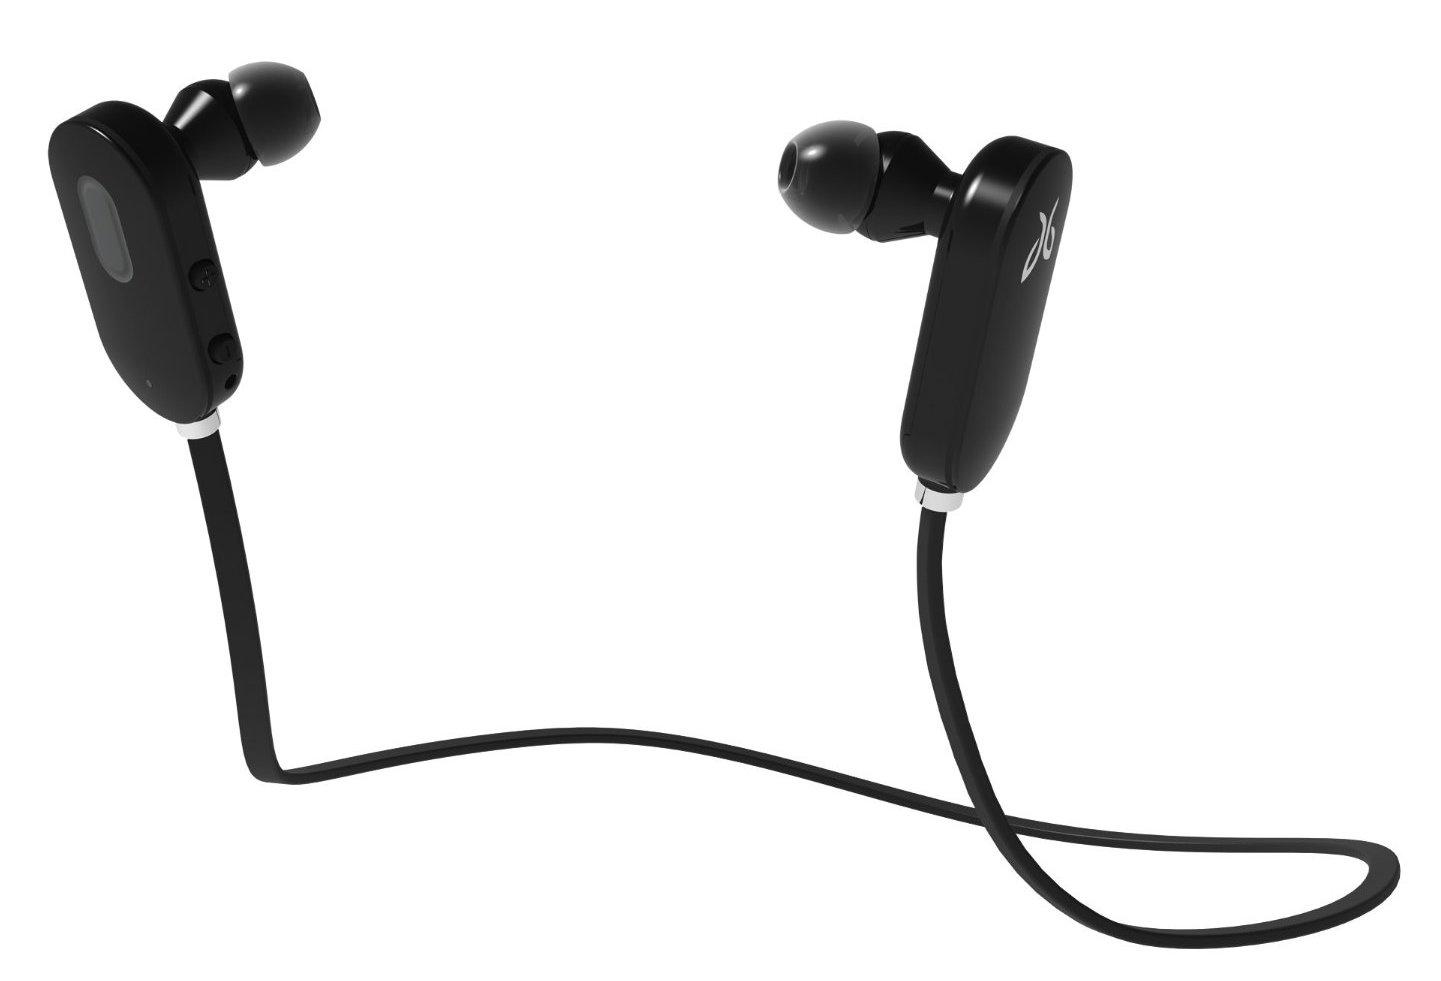 jaybird-freedom-bluetooth-earbuds